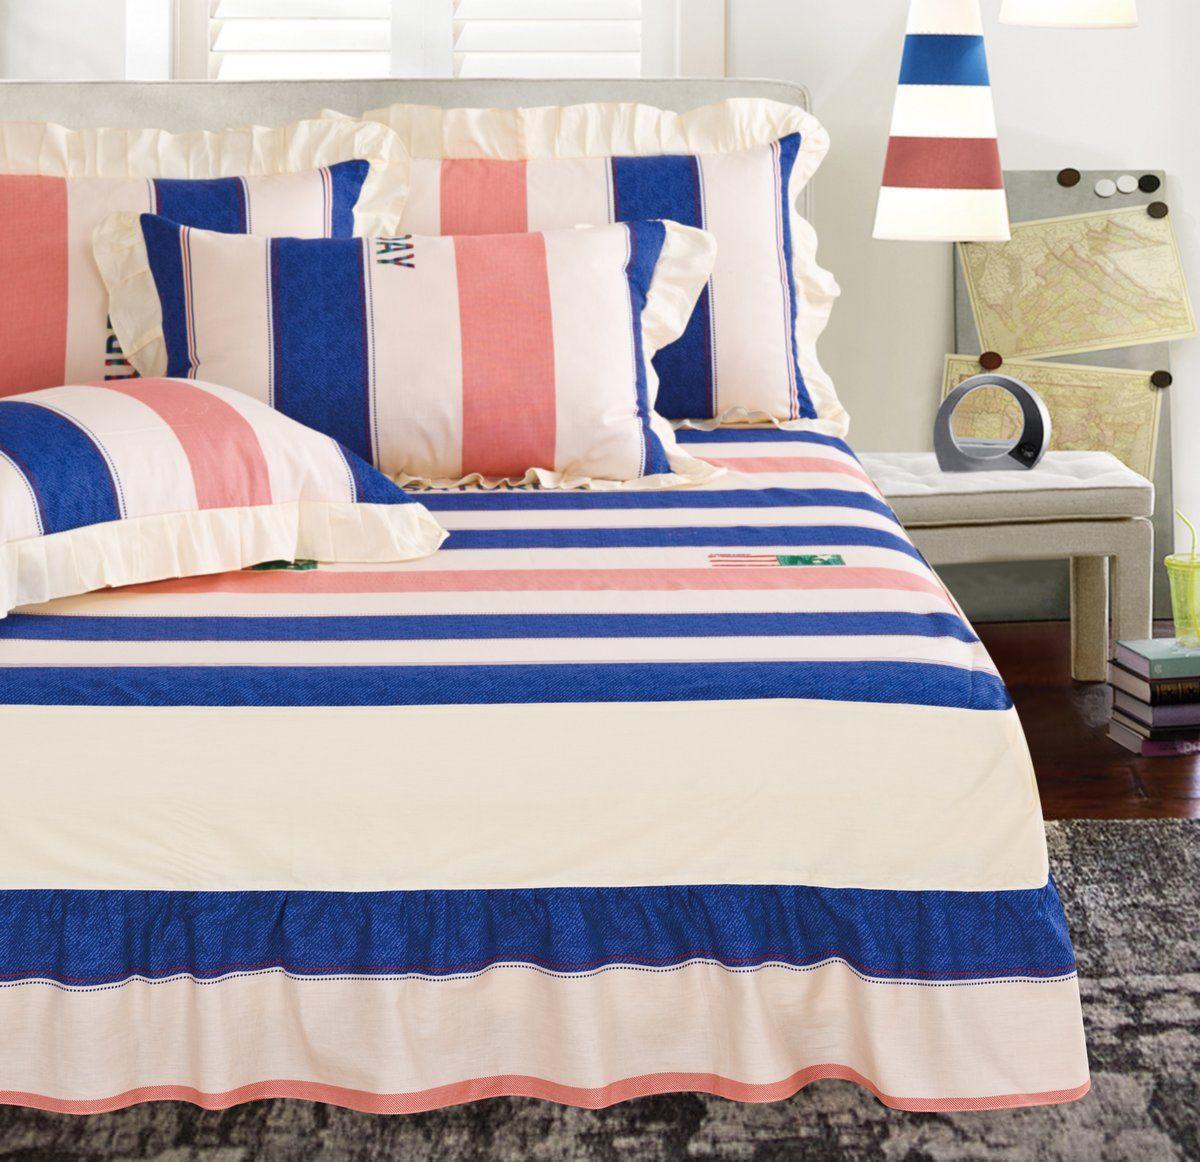 Christmas Fairyfair Princess Bedding Set 100 Cotton